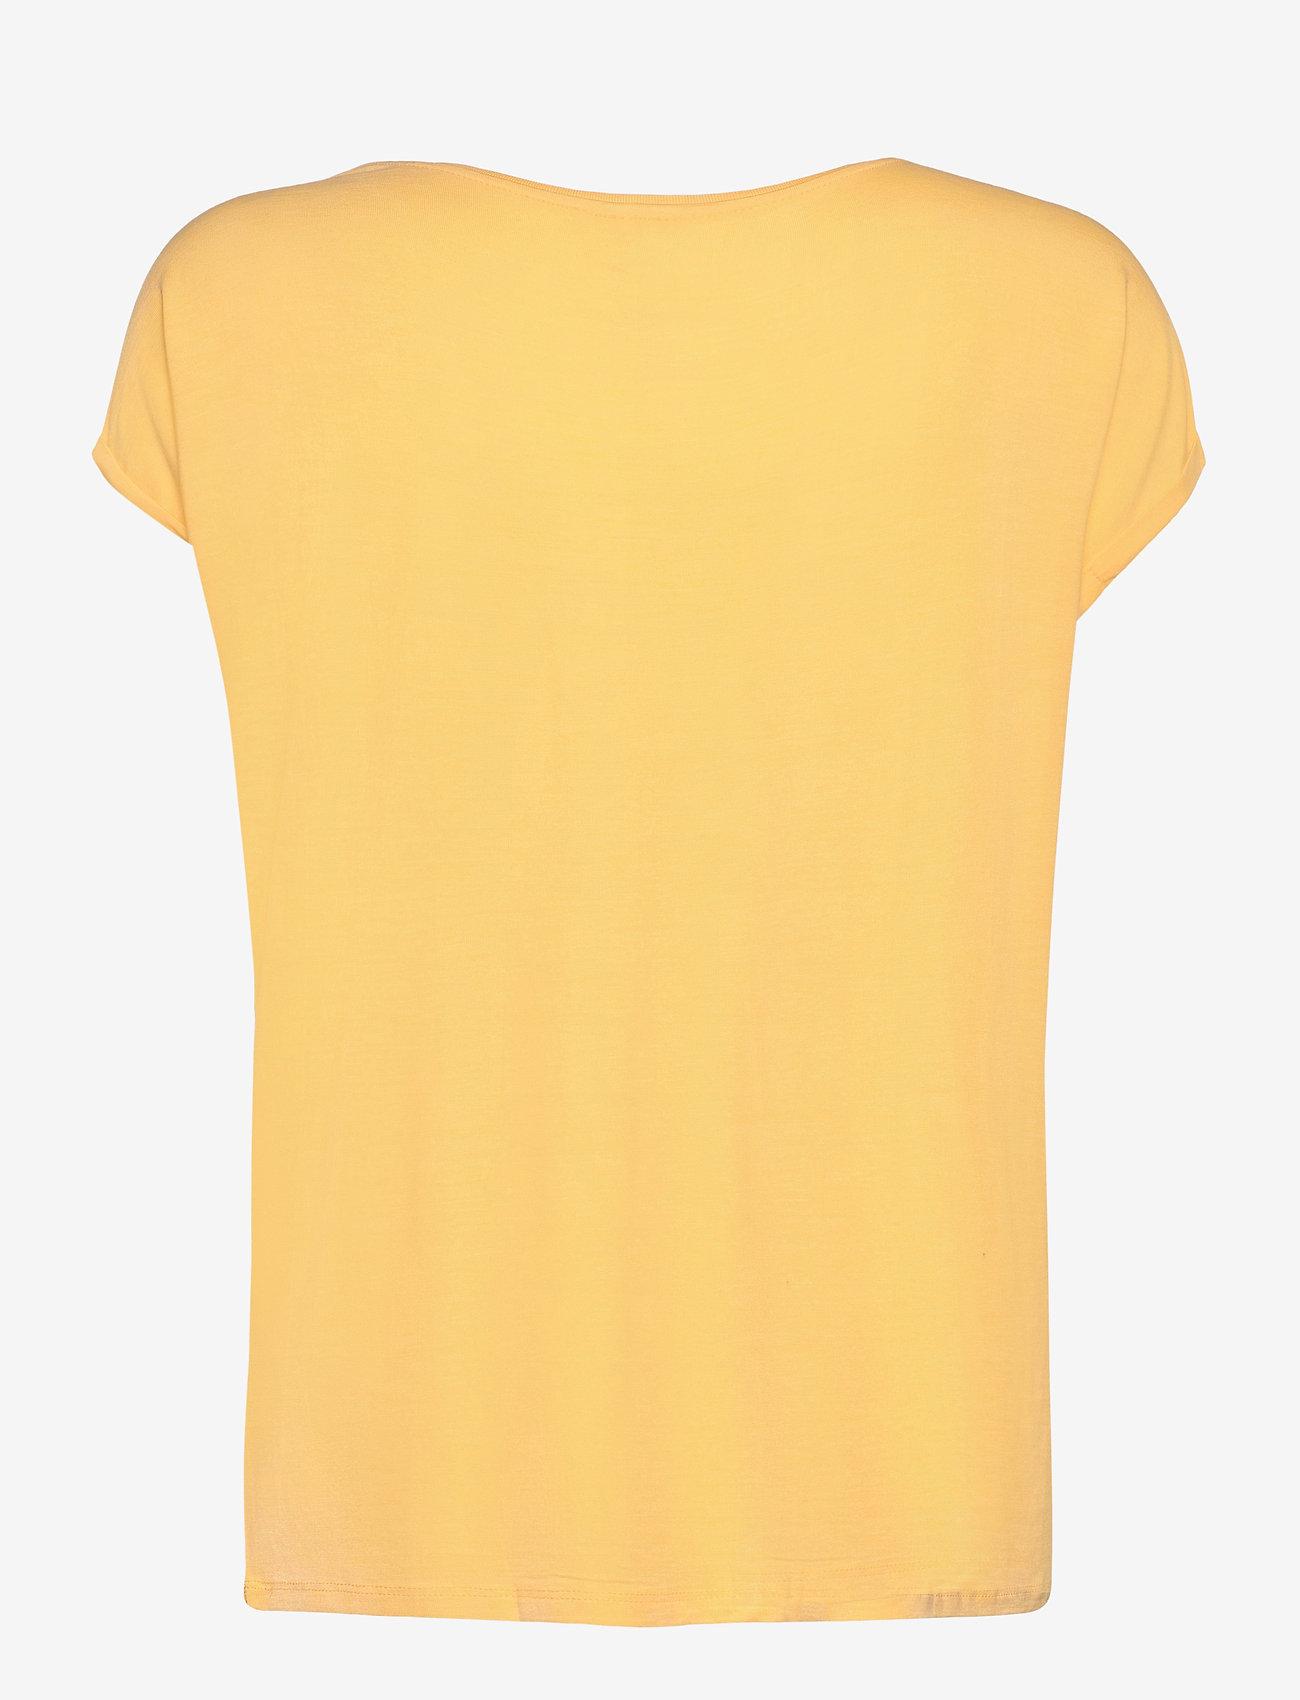 Vero Moda - VMAVA PLAIN SS TOP GA NOOS - t-shirts - cornsilk - 1